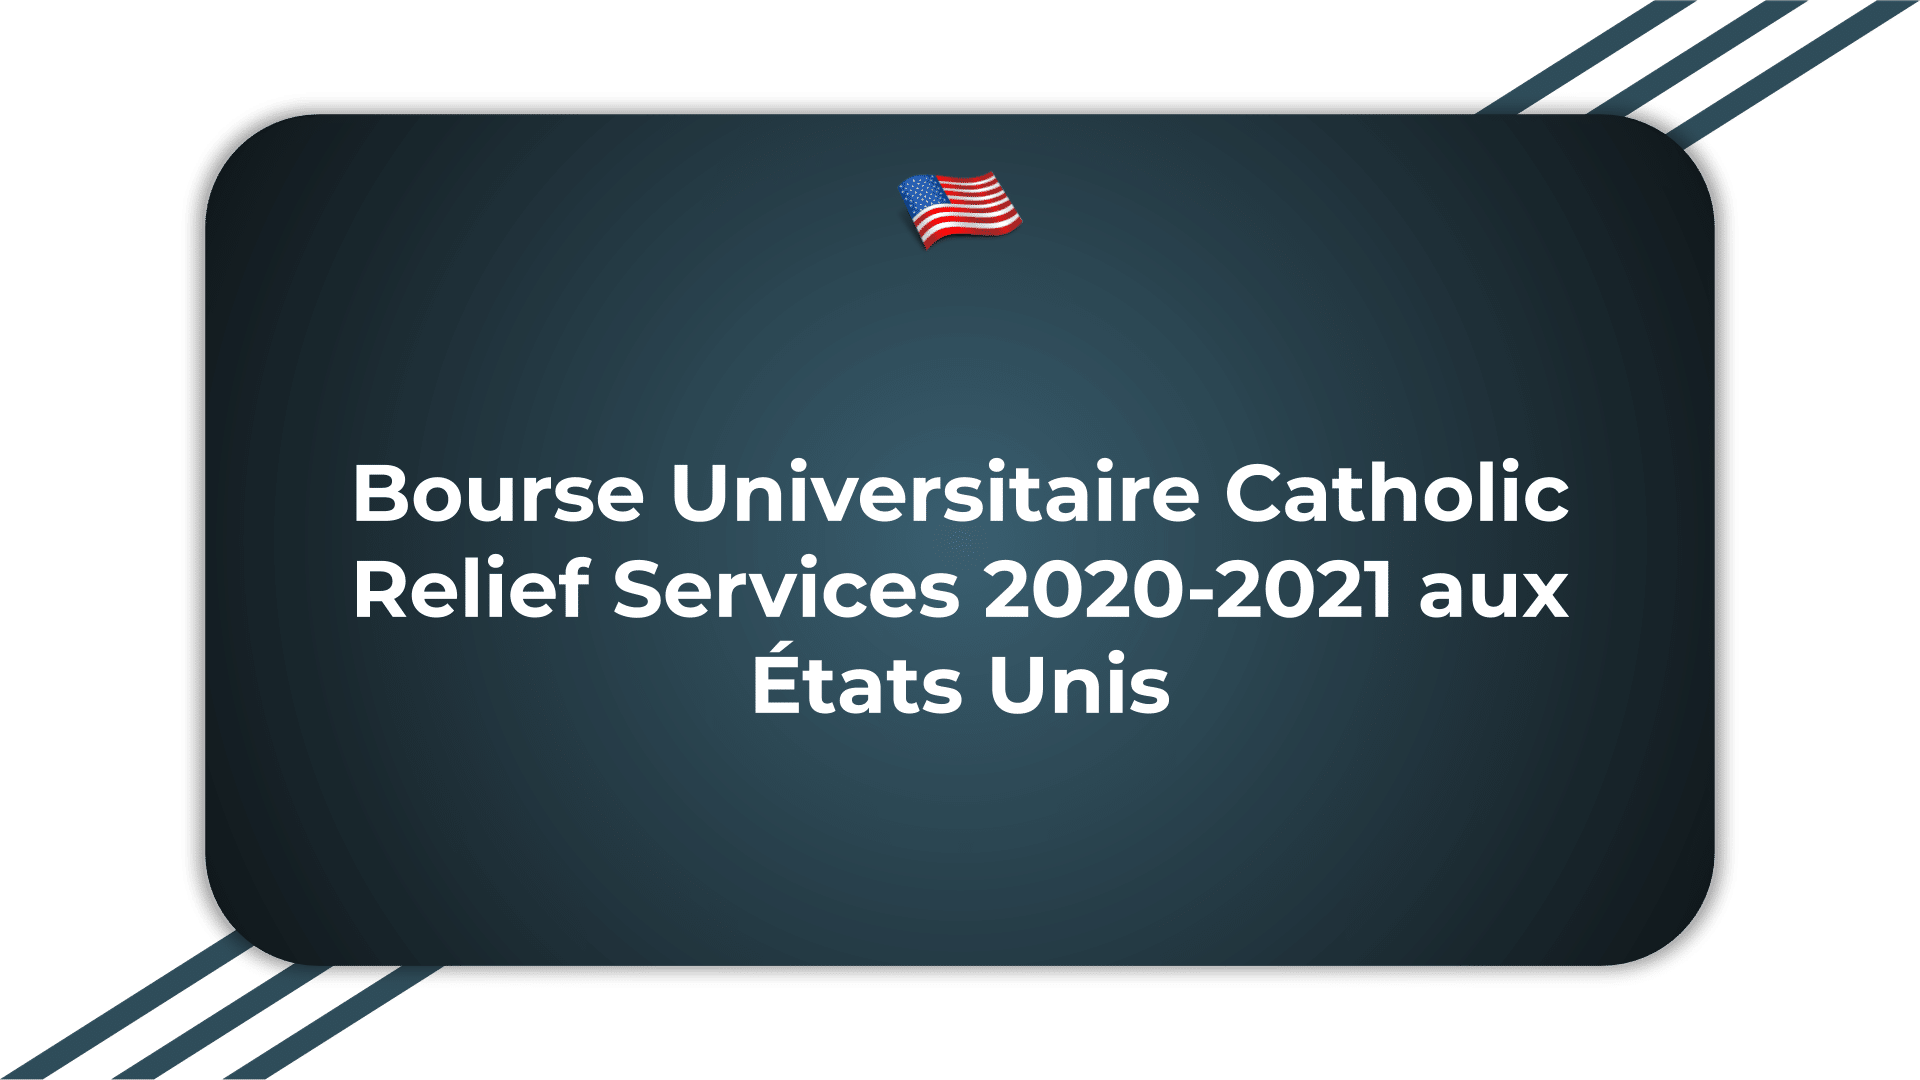 Bourse Universitaire Catholic Relief Services